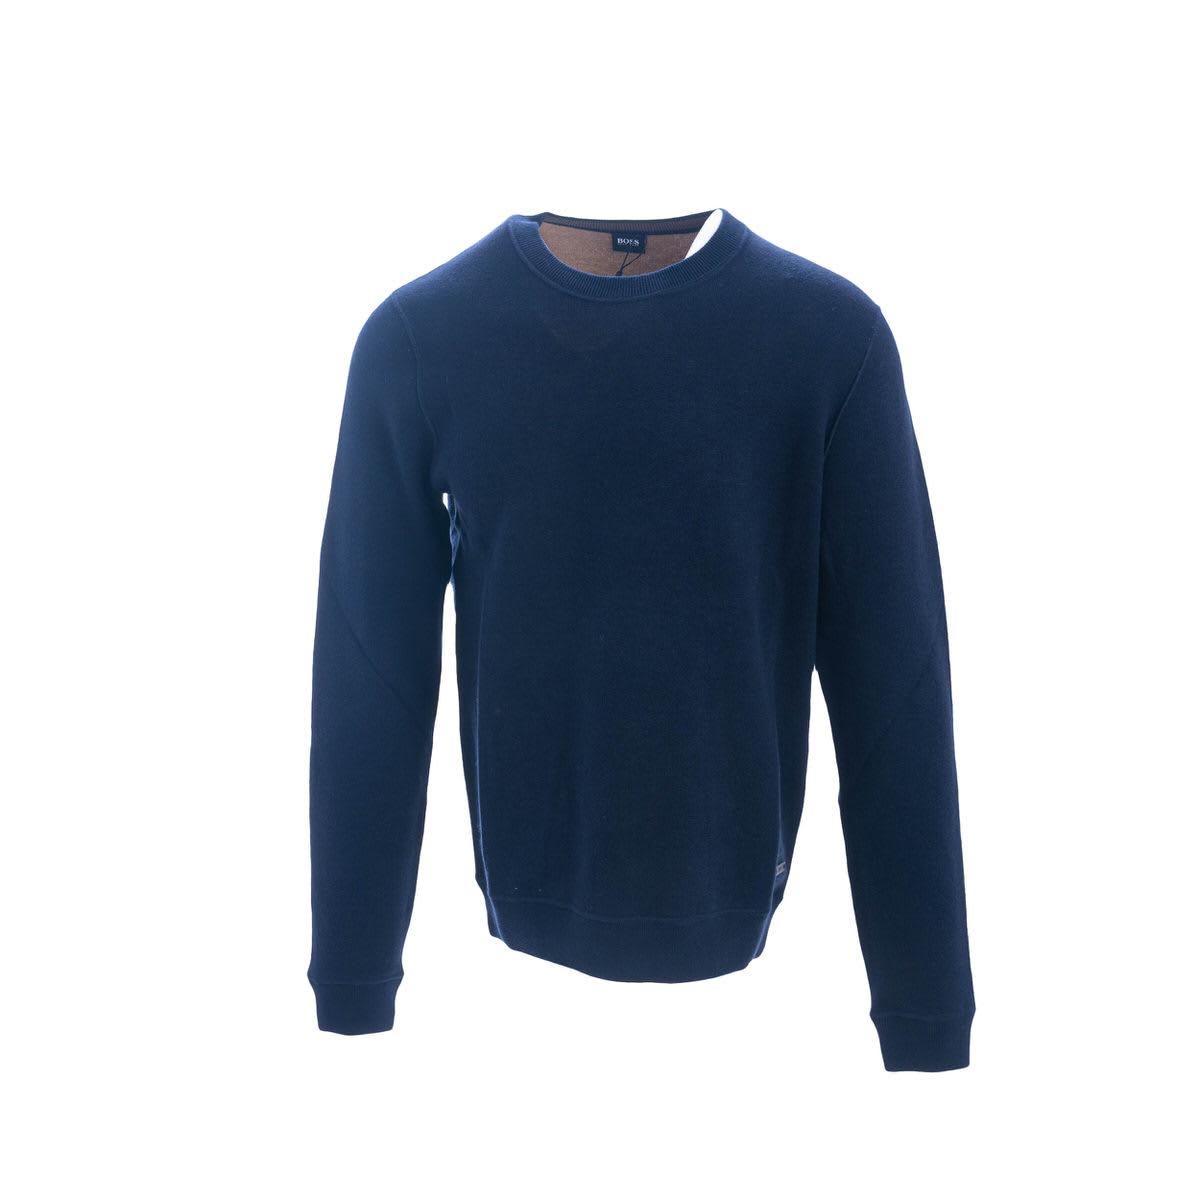 Boss Virgin Wool And Cotton Sweater